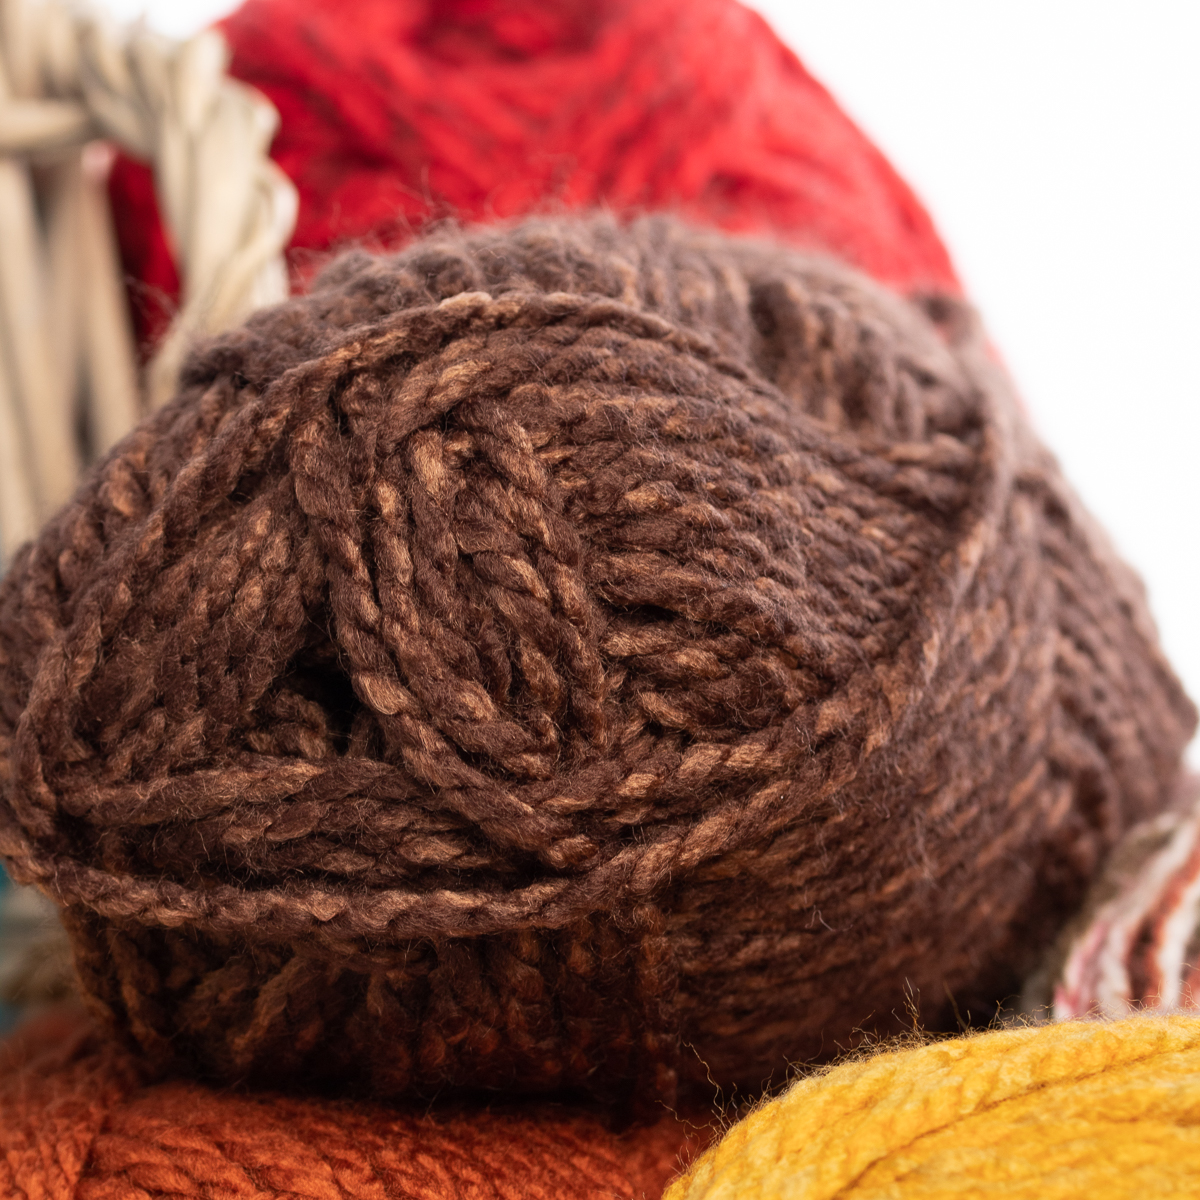 3pk-Premier-Yarns-Deborah-Norville-Serenity-100-Acrylic-Yarn-Chunky-5-Knitting thumbnail 39